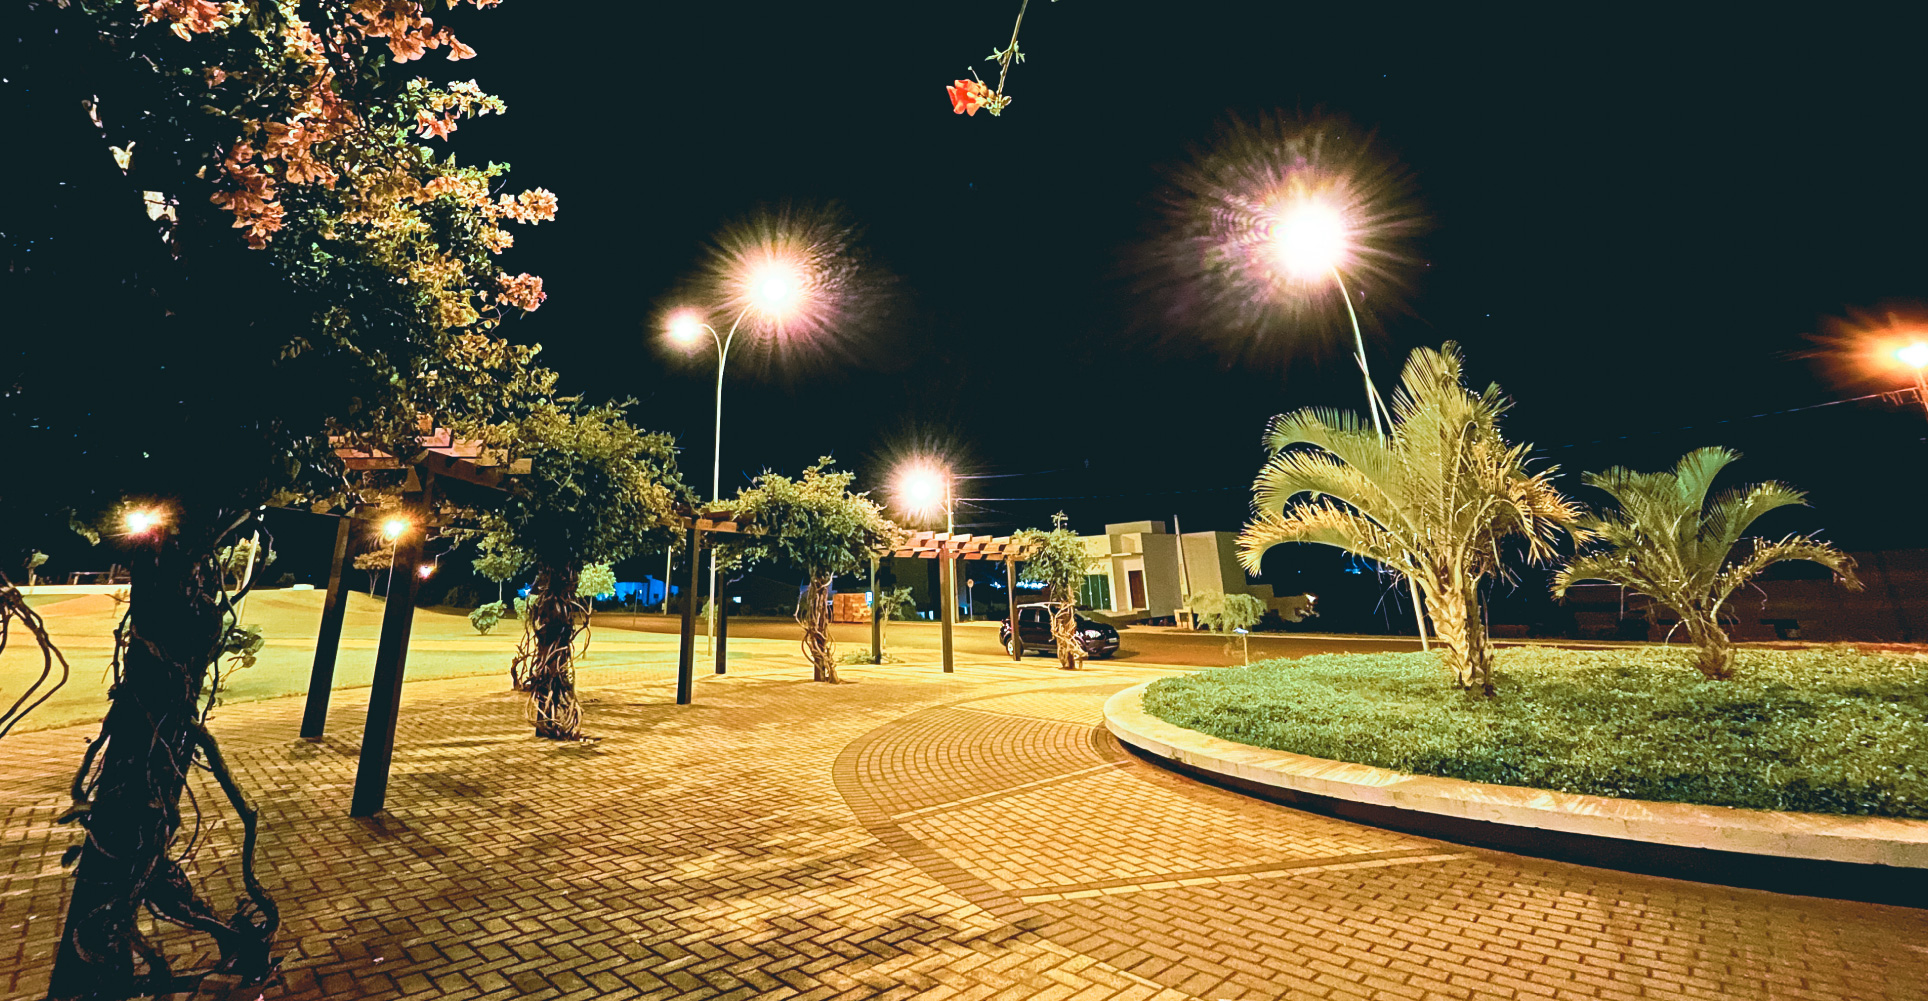 Praça anoitecer